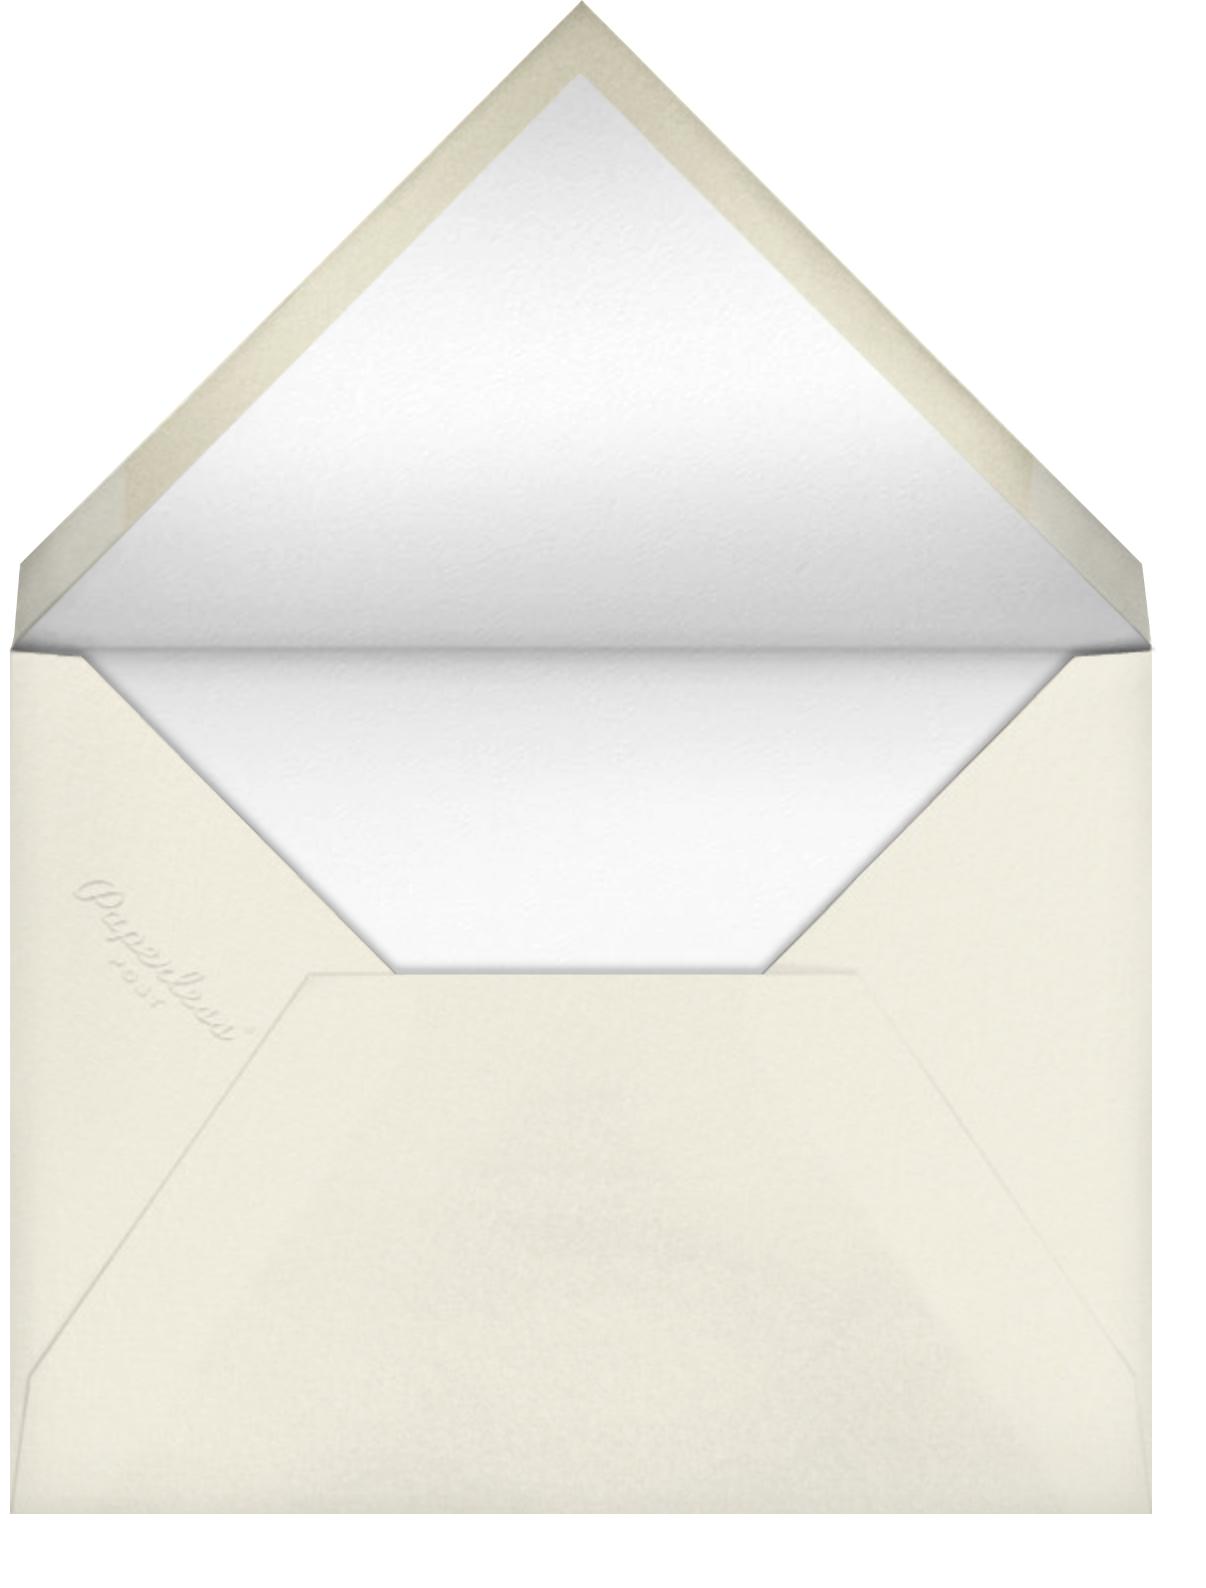 Kitty Hawk Greetings - Cream - Paperless Post - null - envelope back